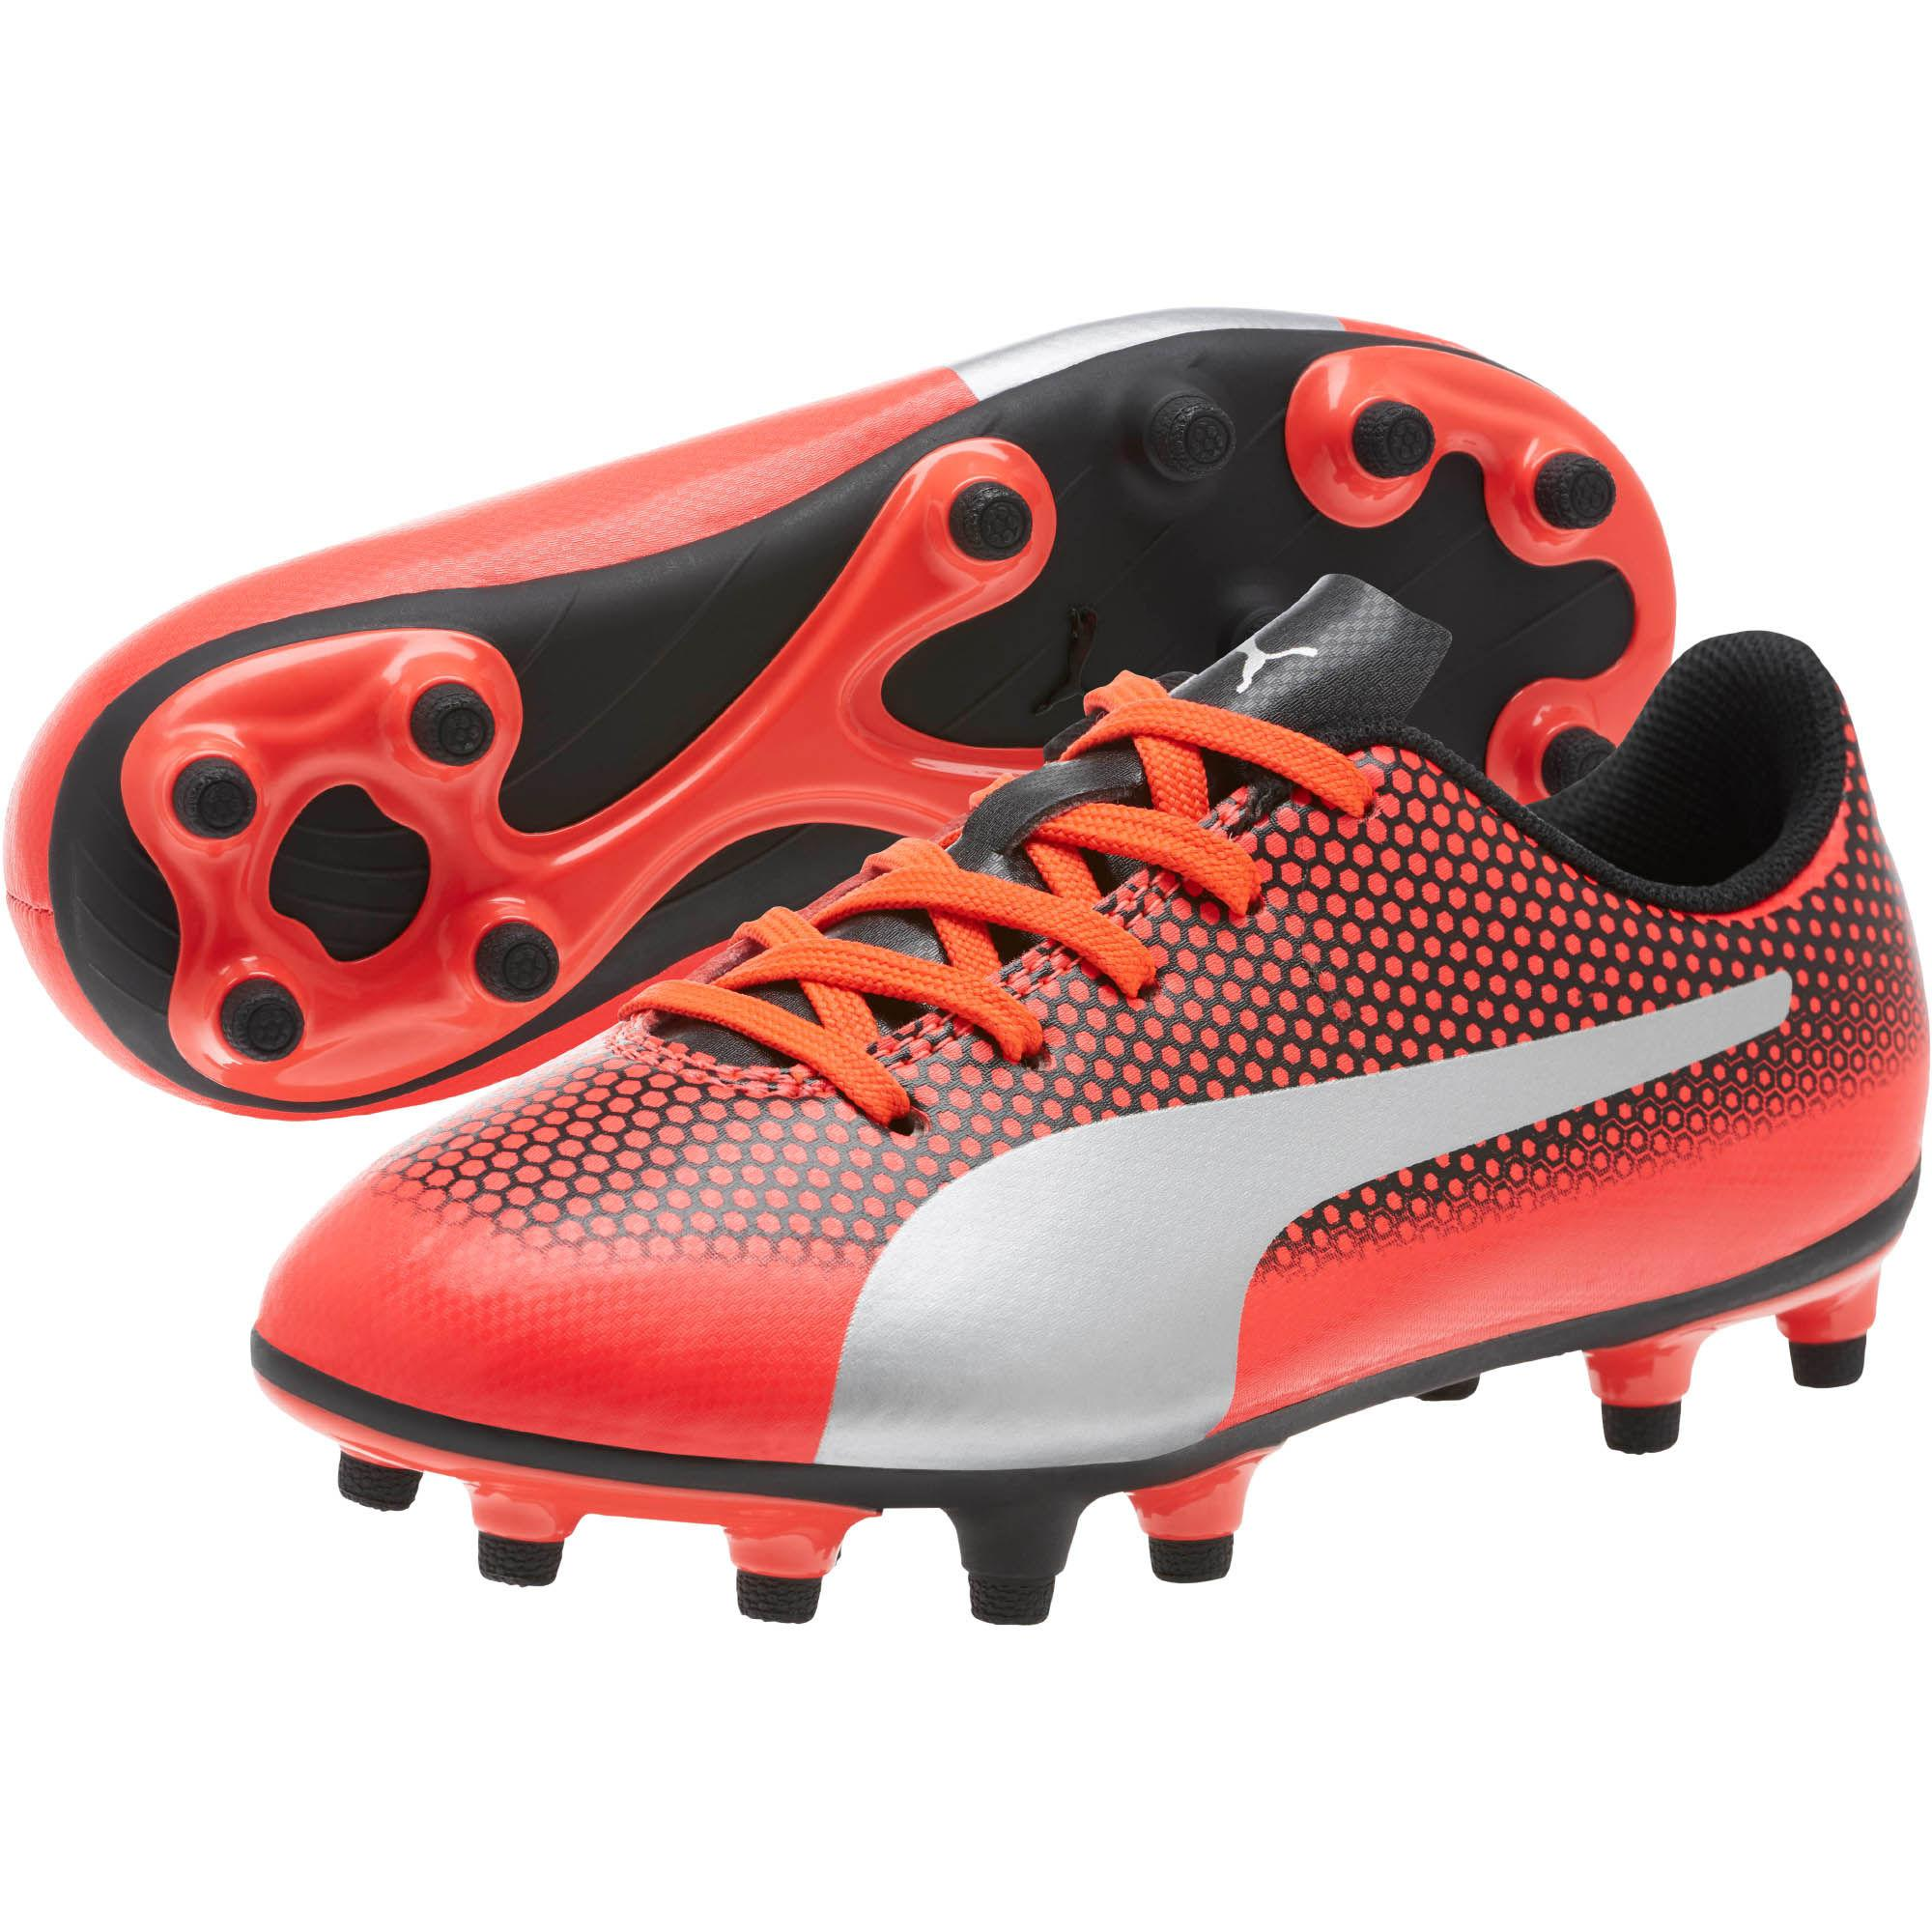 ebcddc1582bcd0 ... hot puma red spirit fg jr soccer cleats for men lyst. view fullscreen  45797 66a21